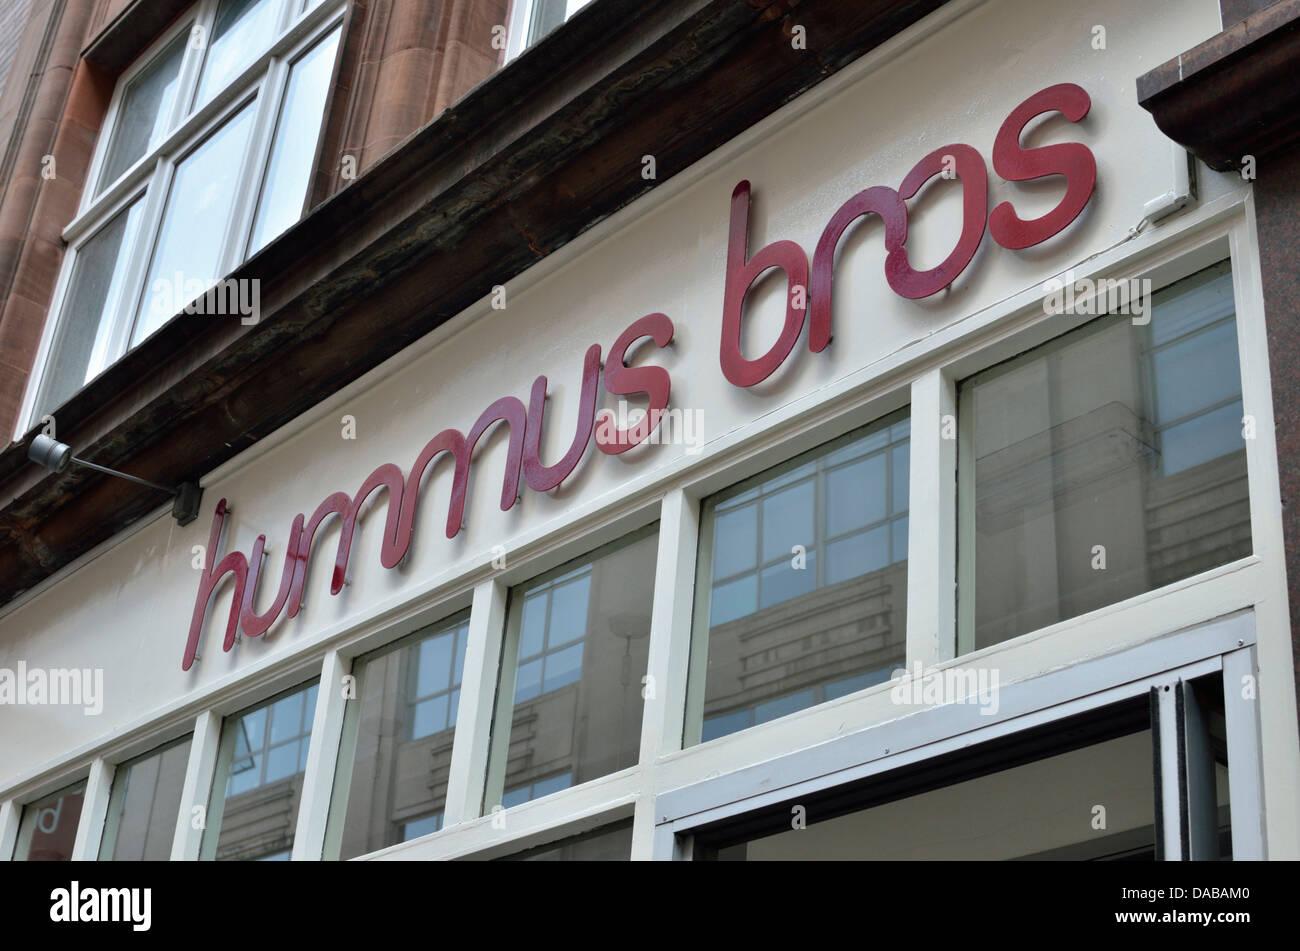 Hummus Bros vegetarian restaurant in Wardour Street, Soho, London, UK. - Stock Image